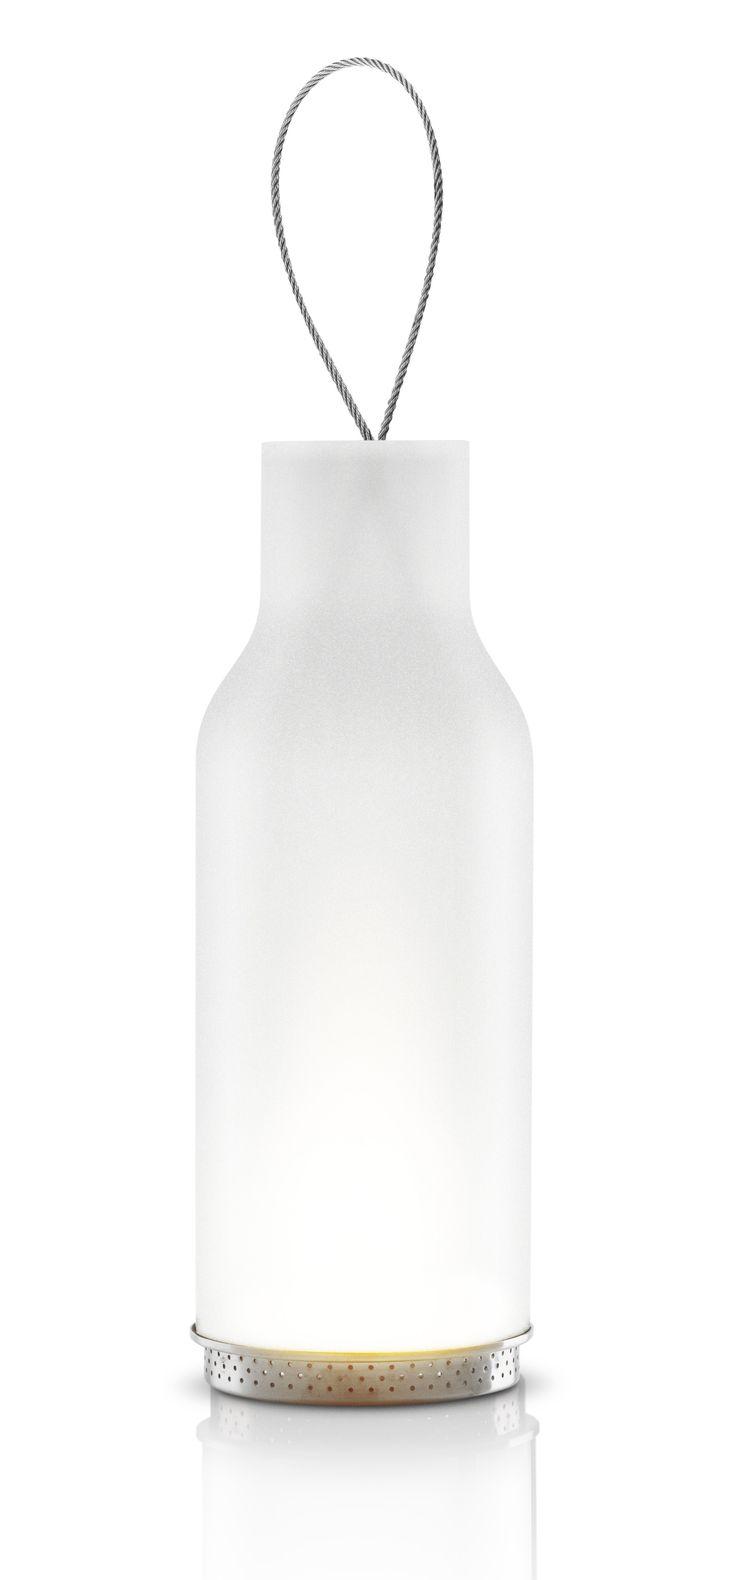 Big glass lantern by Eva Solo